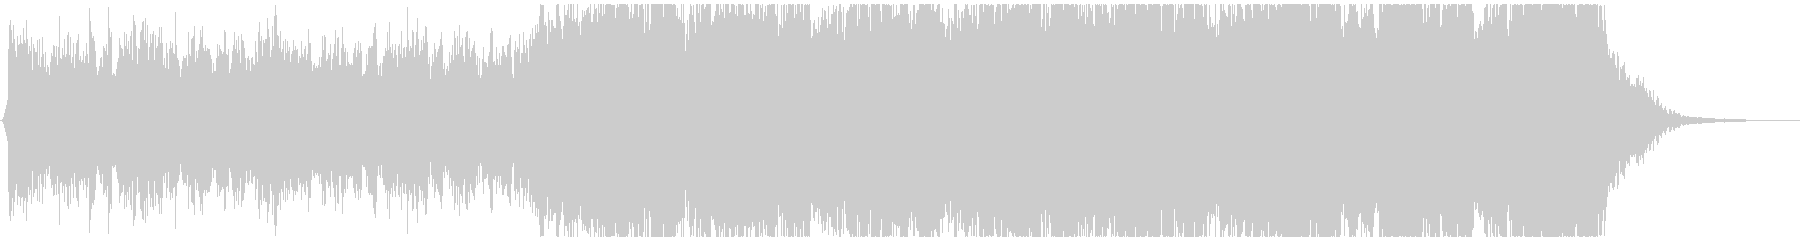 Horizon XIIの未再生の波形